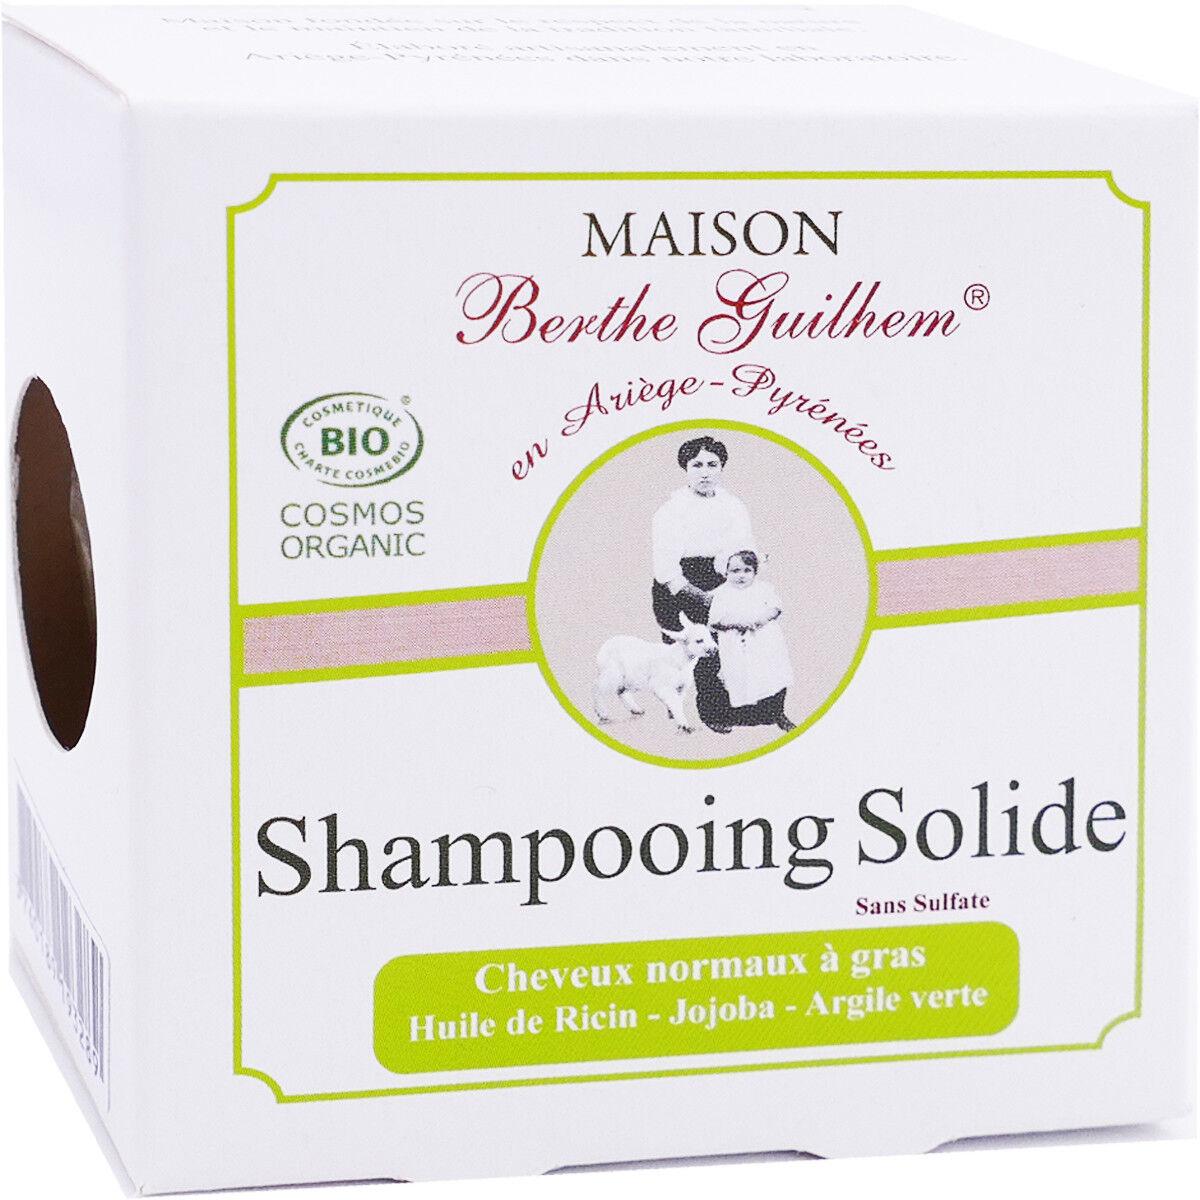 Berthe guilhem shampooing solide 100g huile de ricin jojoba argile verte